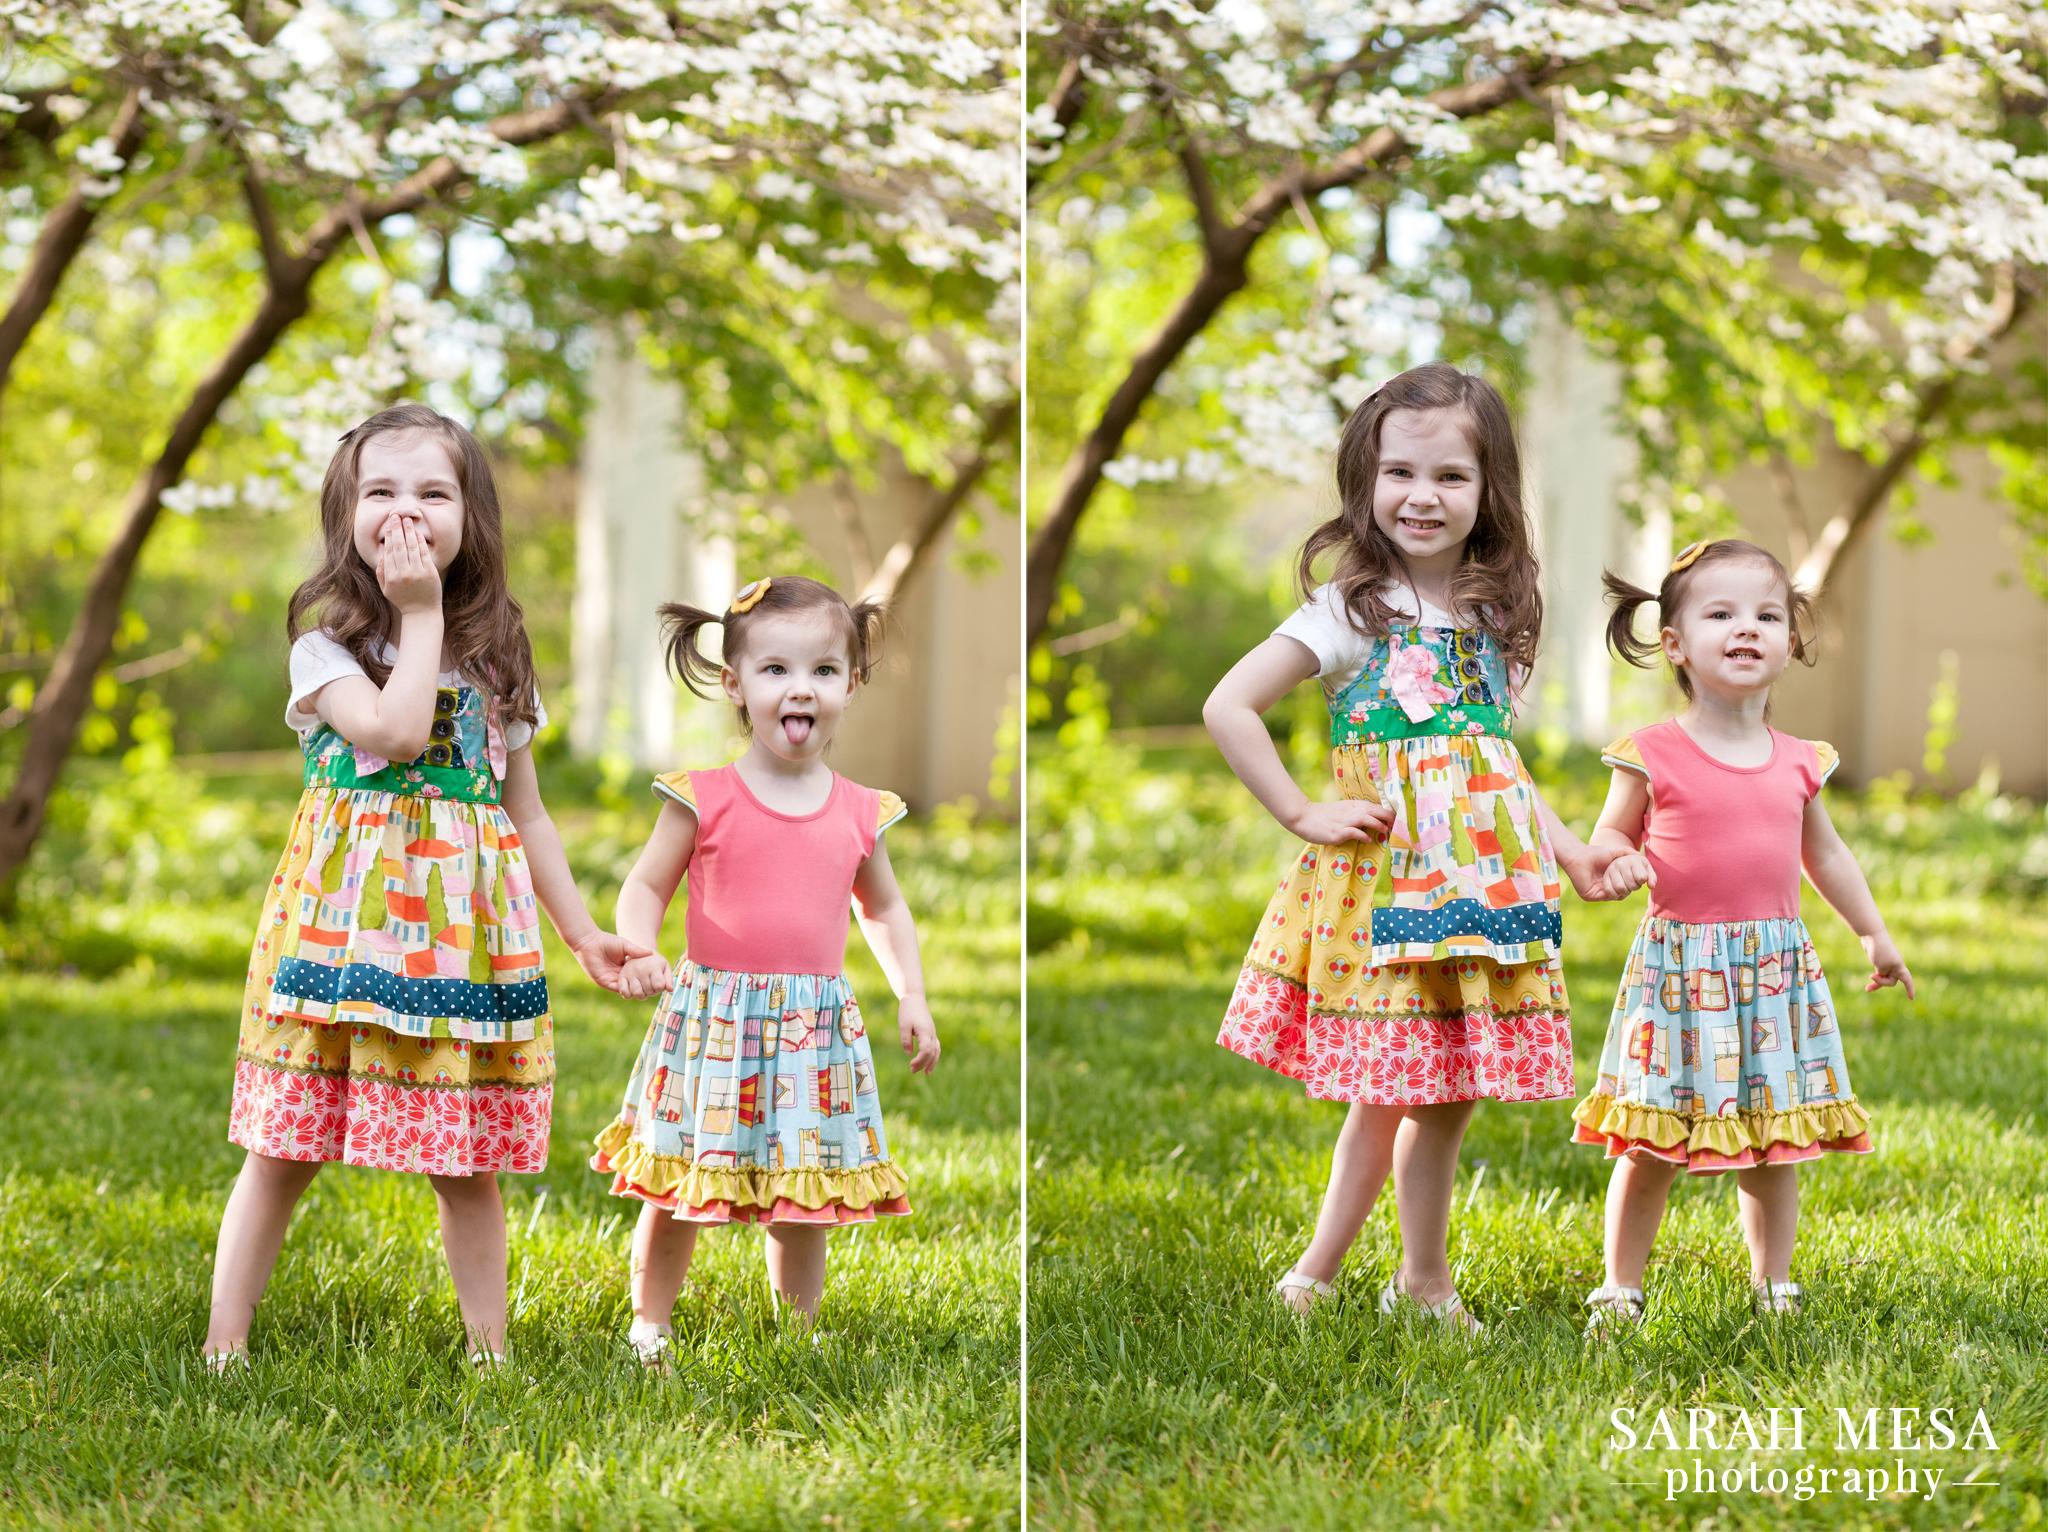 Sarah Mesa Photography | Louisville, KY Family and Portrait Photographer